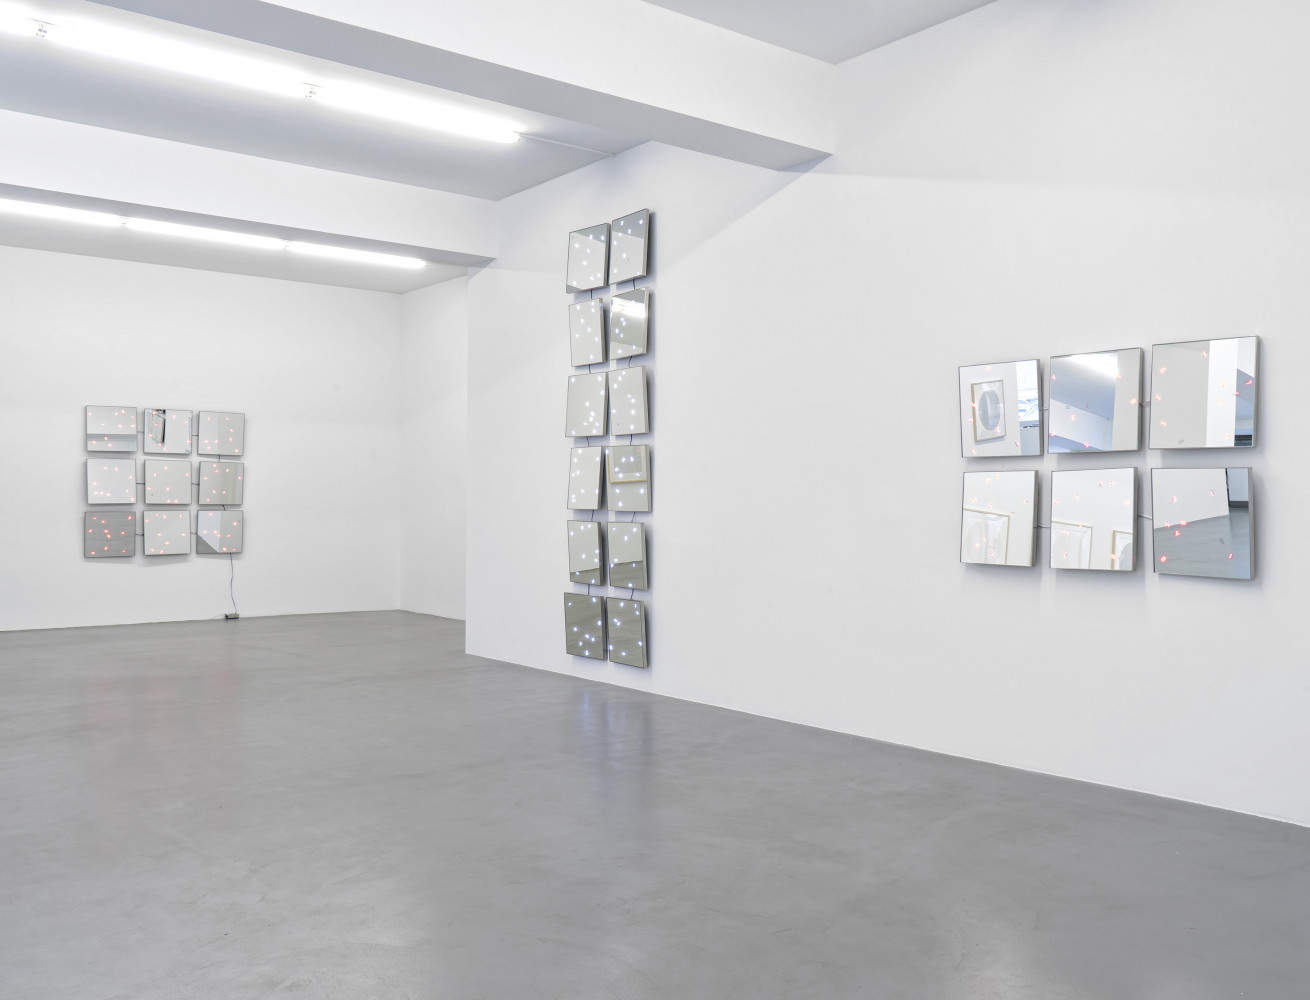 Tatsuo Miyajima, Installation view, Buchmann Galerie, 2017